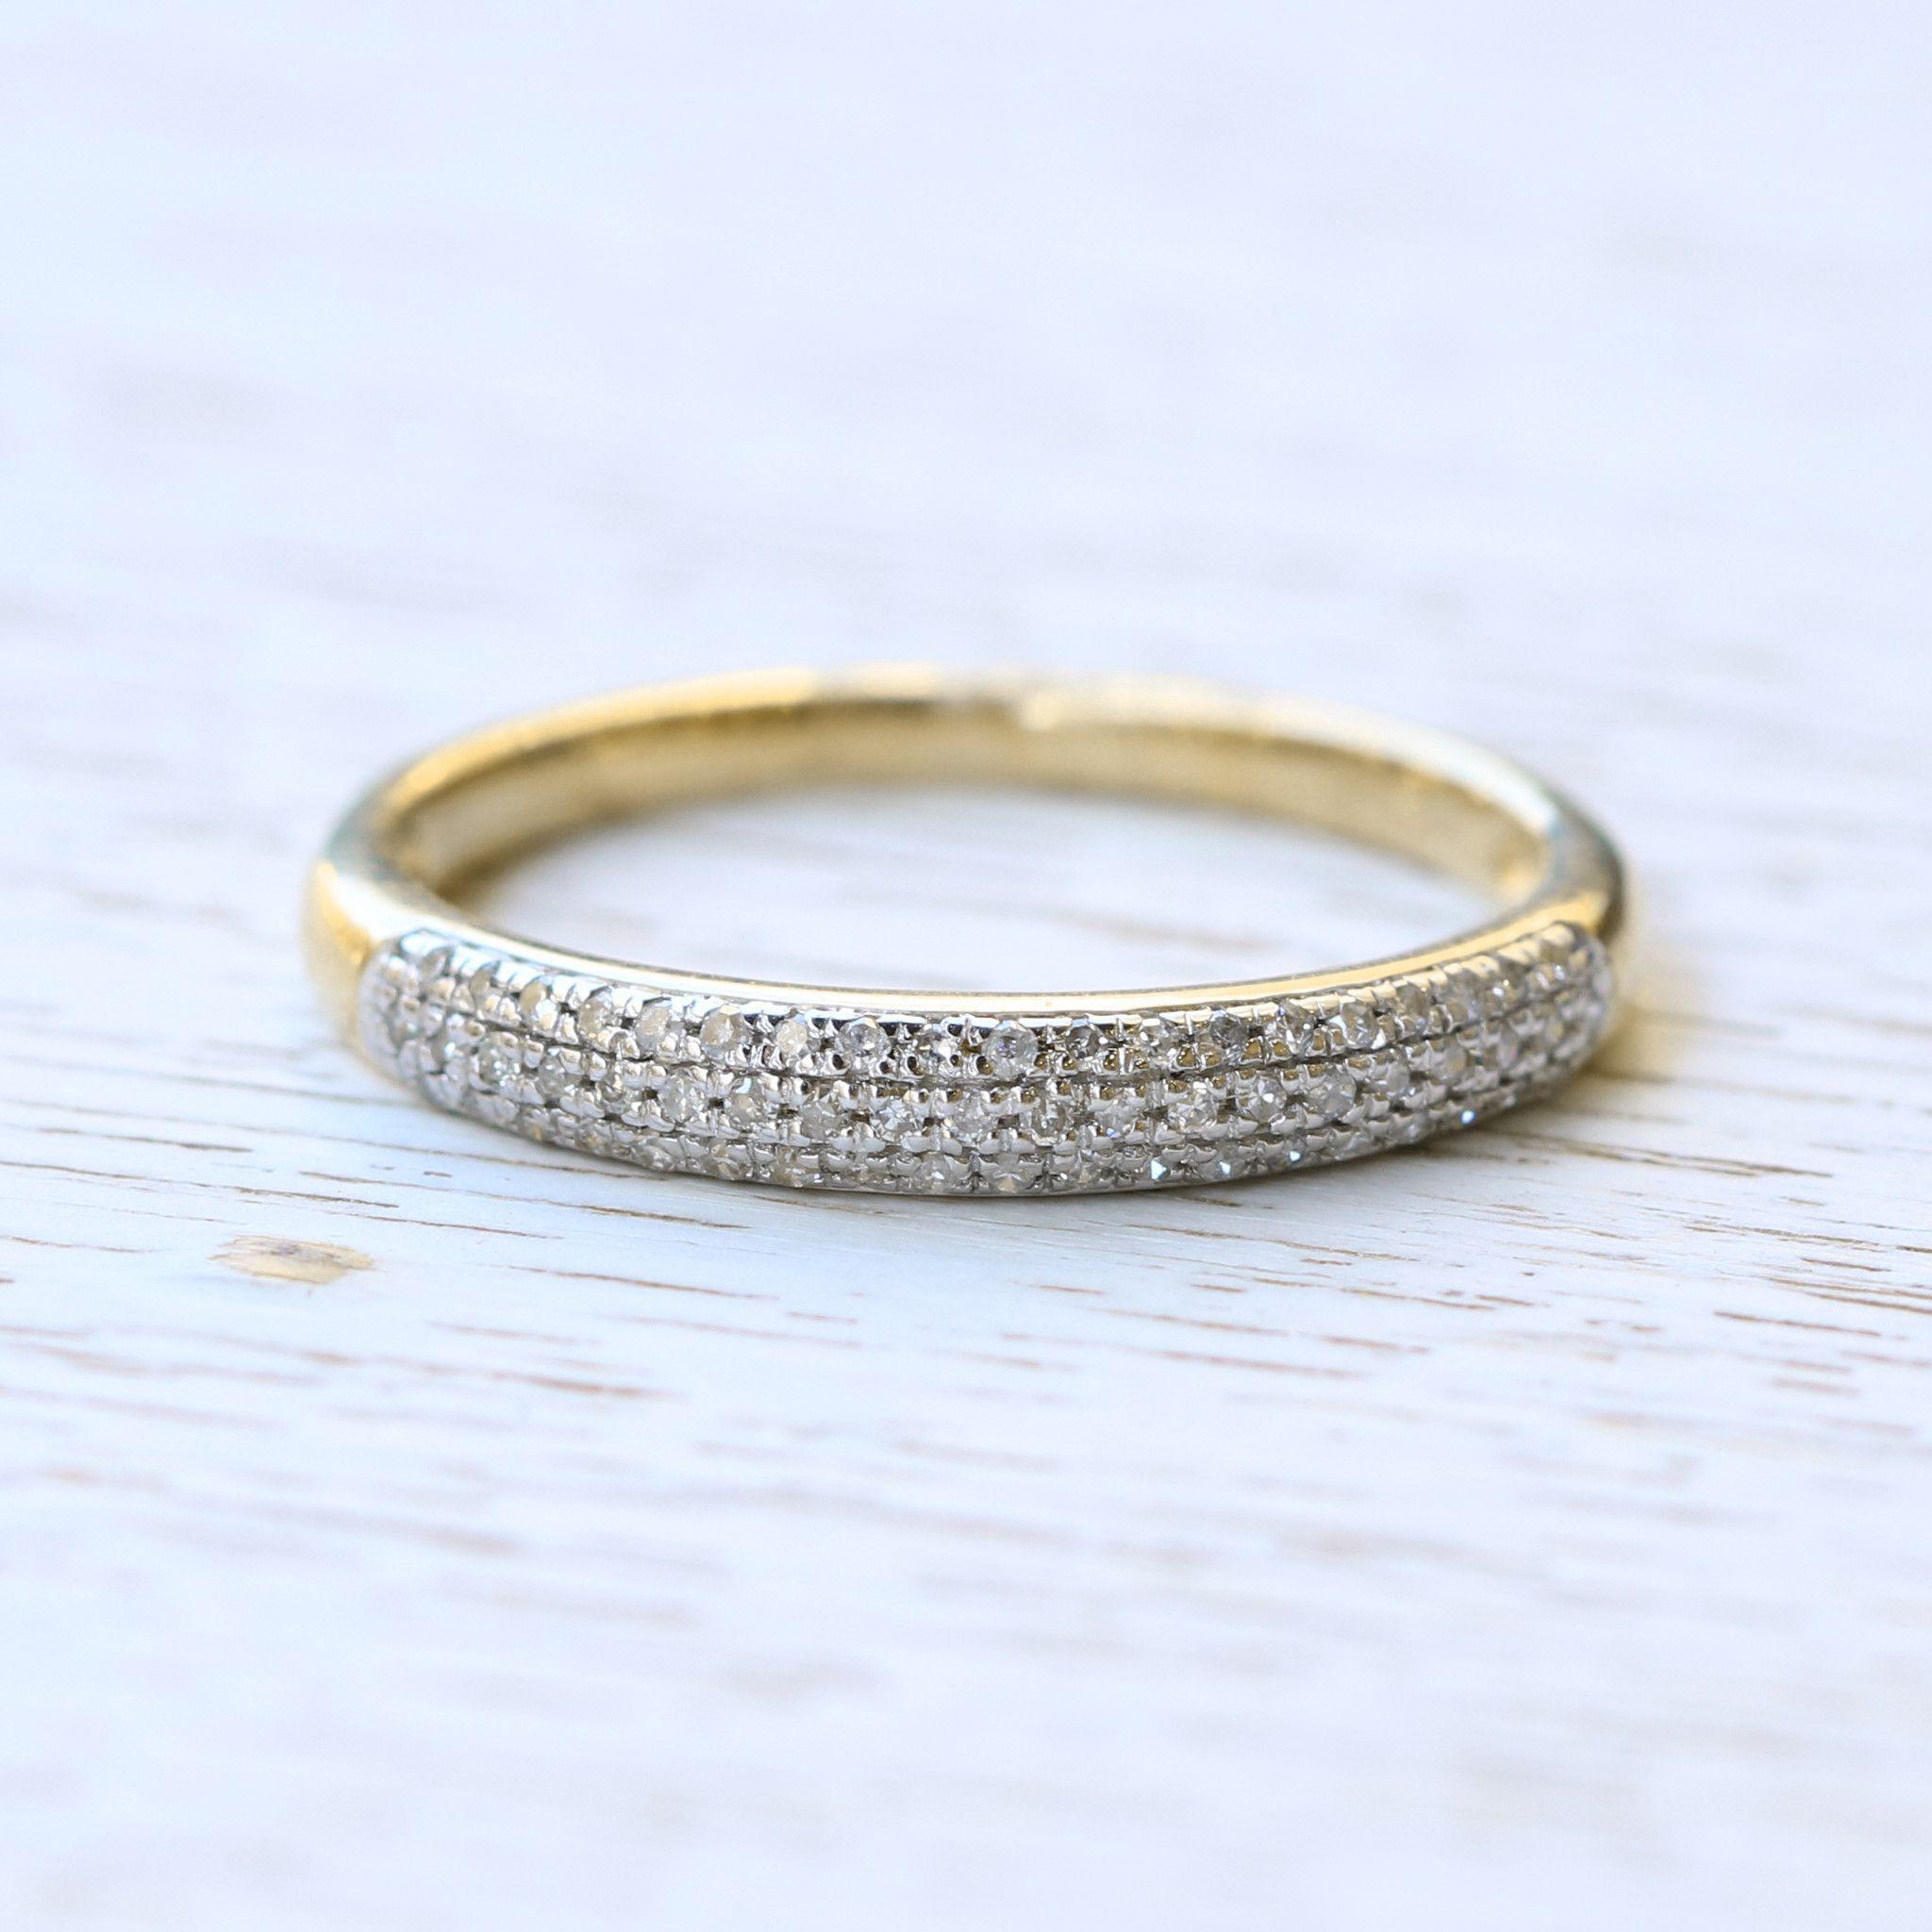 10K Yellow Gold Rounded Pavé Diamond Ring